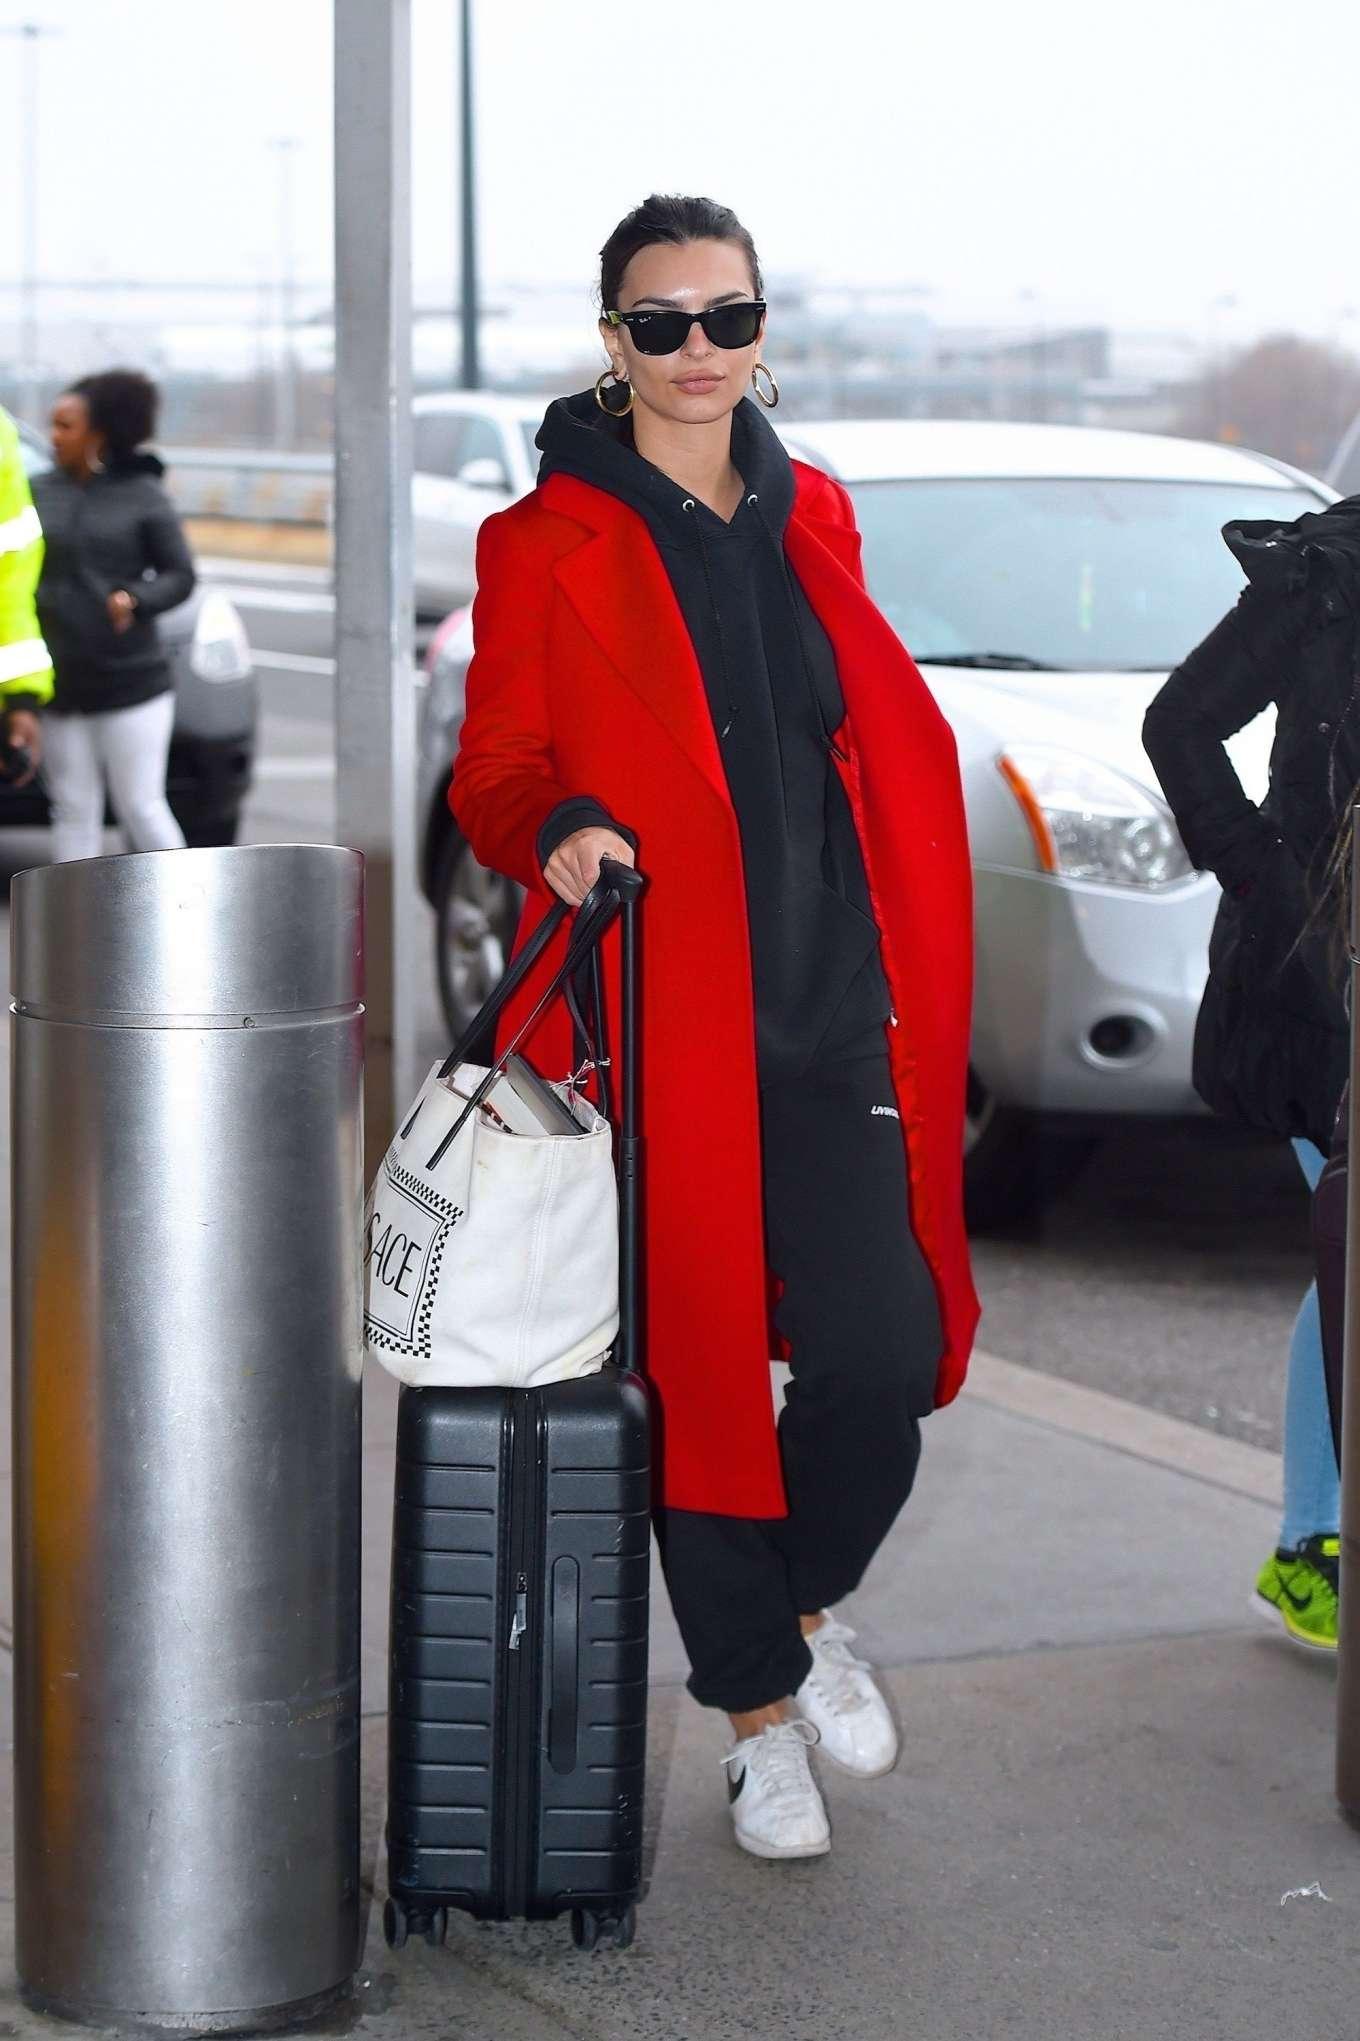 Emily Ratajkowski 2020 : Emily Ratajkowski in red coat ready for flight at JFK airport-15